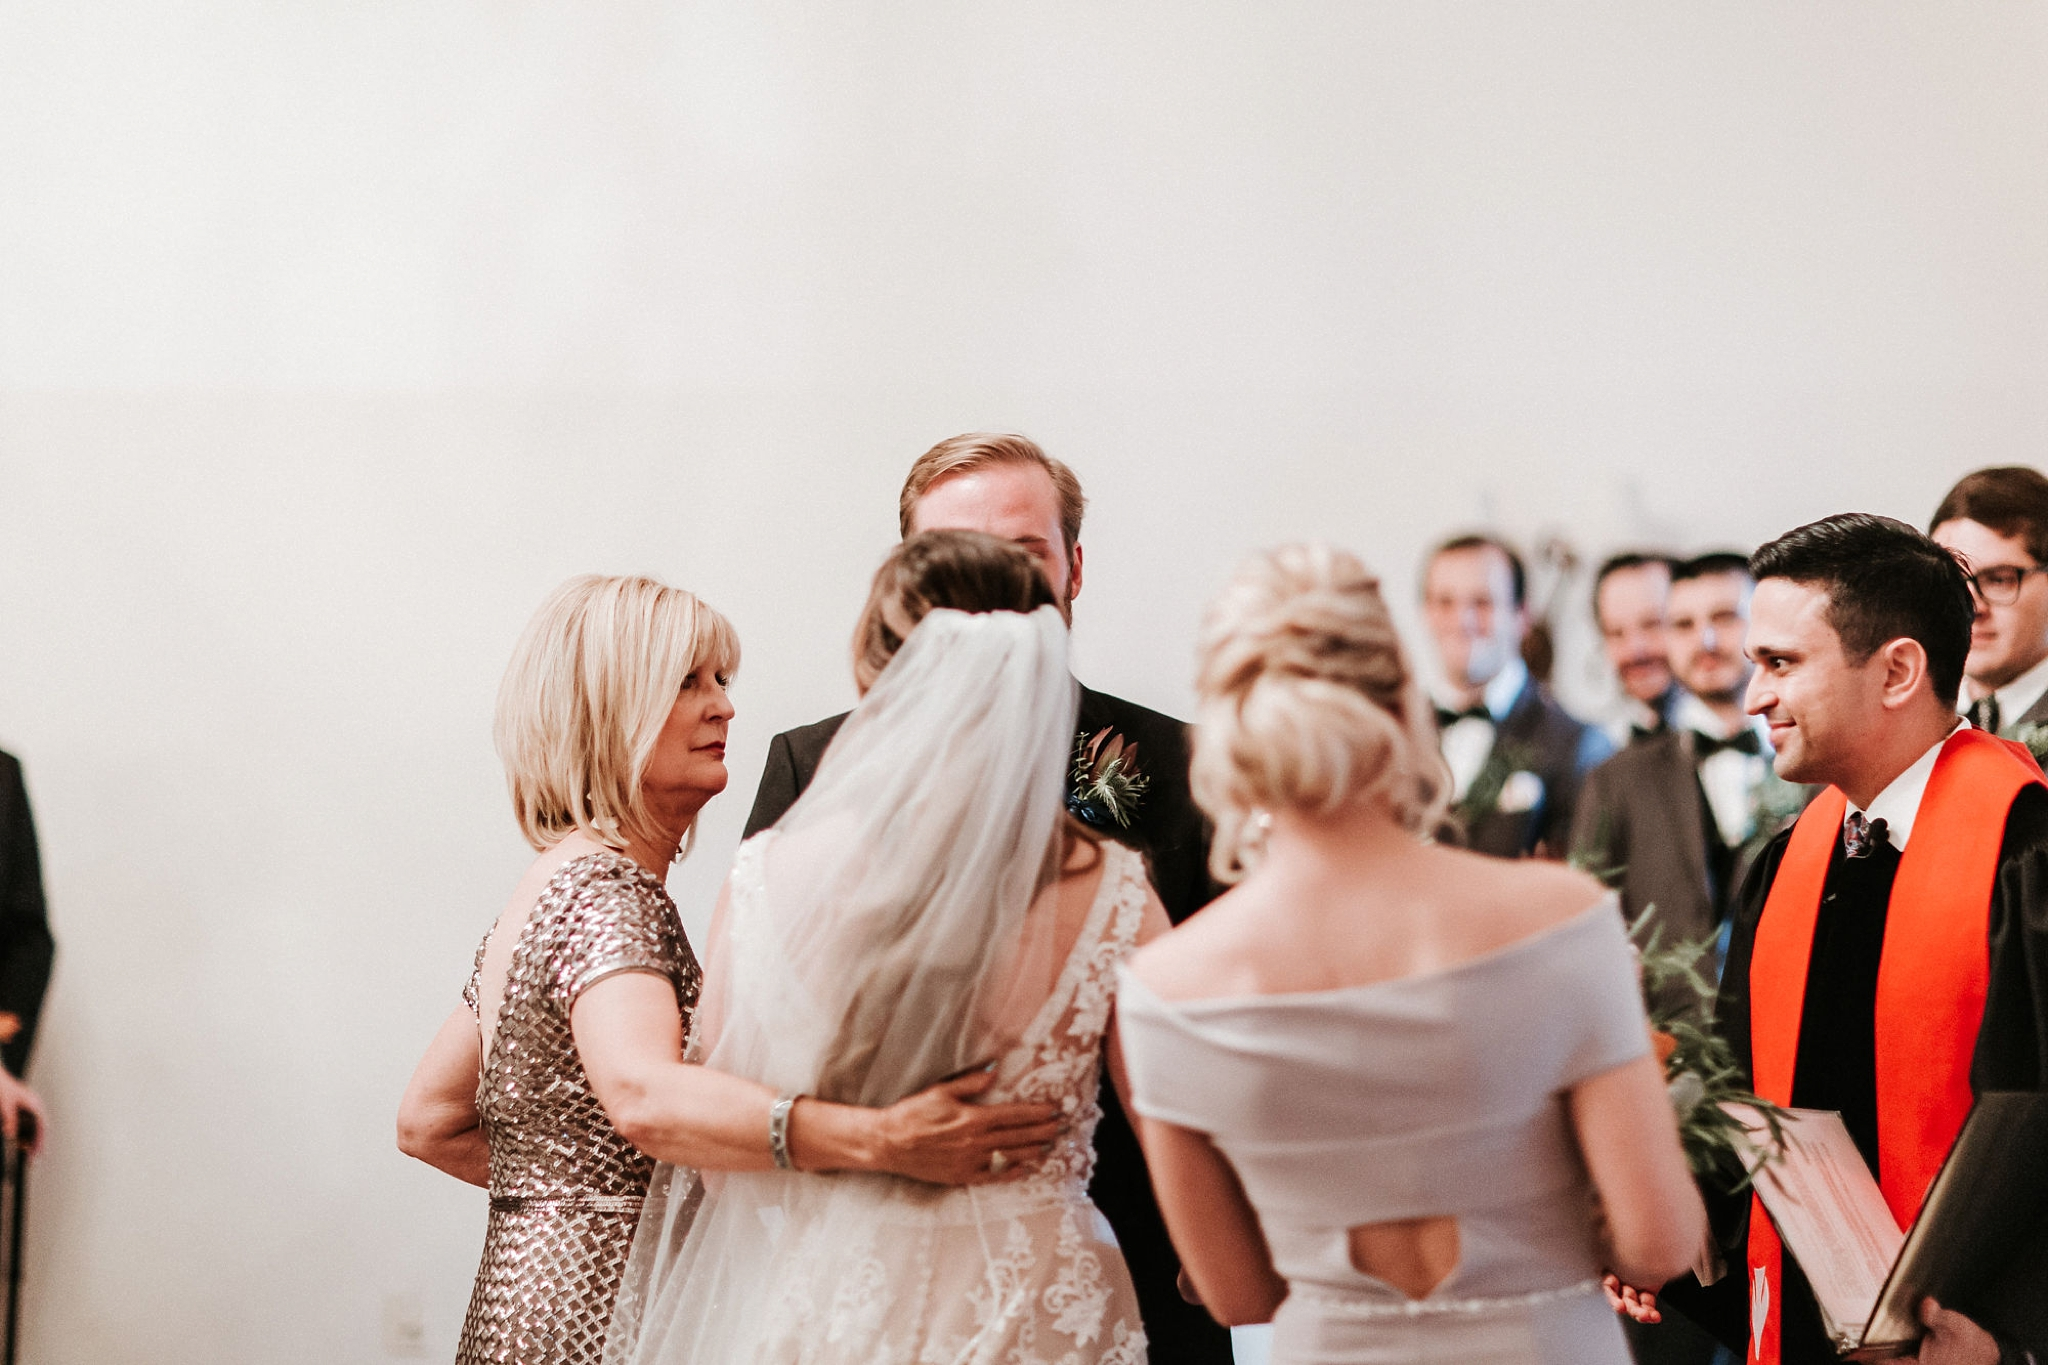 Alicia+lucia+photography+-+albuquerque+wedding+photographer+-+santa+fe+wedding+photography+-+new+mexico+wedding+photographer+-+new+mexico+wedding+-+family+photographer+-+mothers+day+-+mother+of+the+bride_0041.jpg